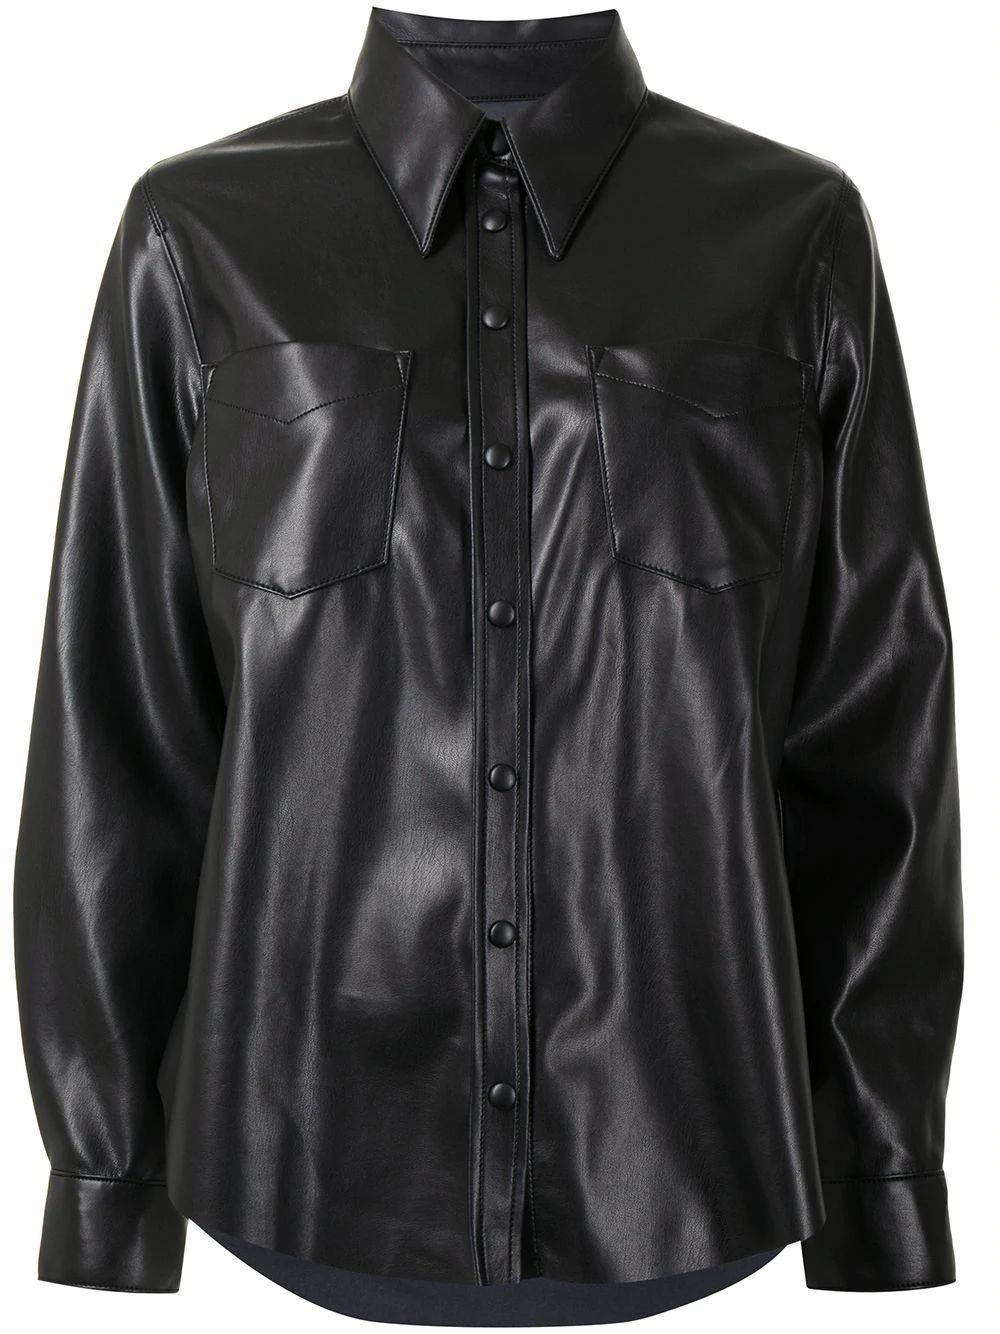 Paloma Faux- Leather Shirt Item # A7060-1287